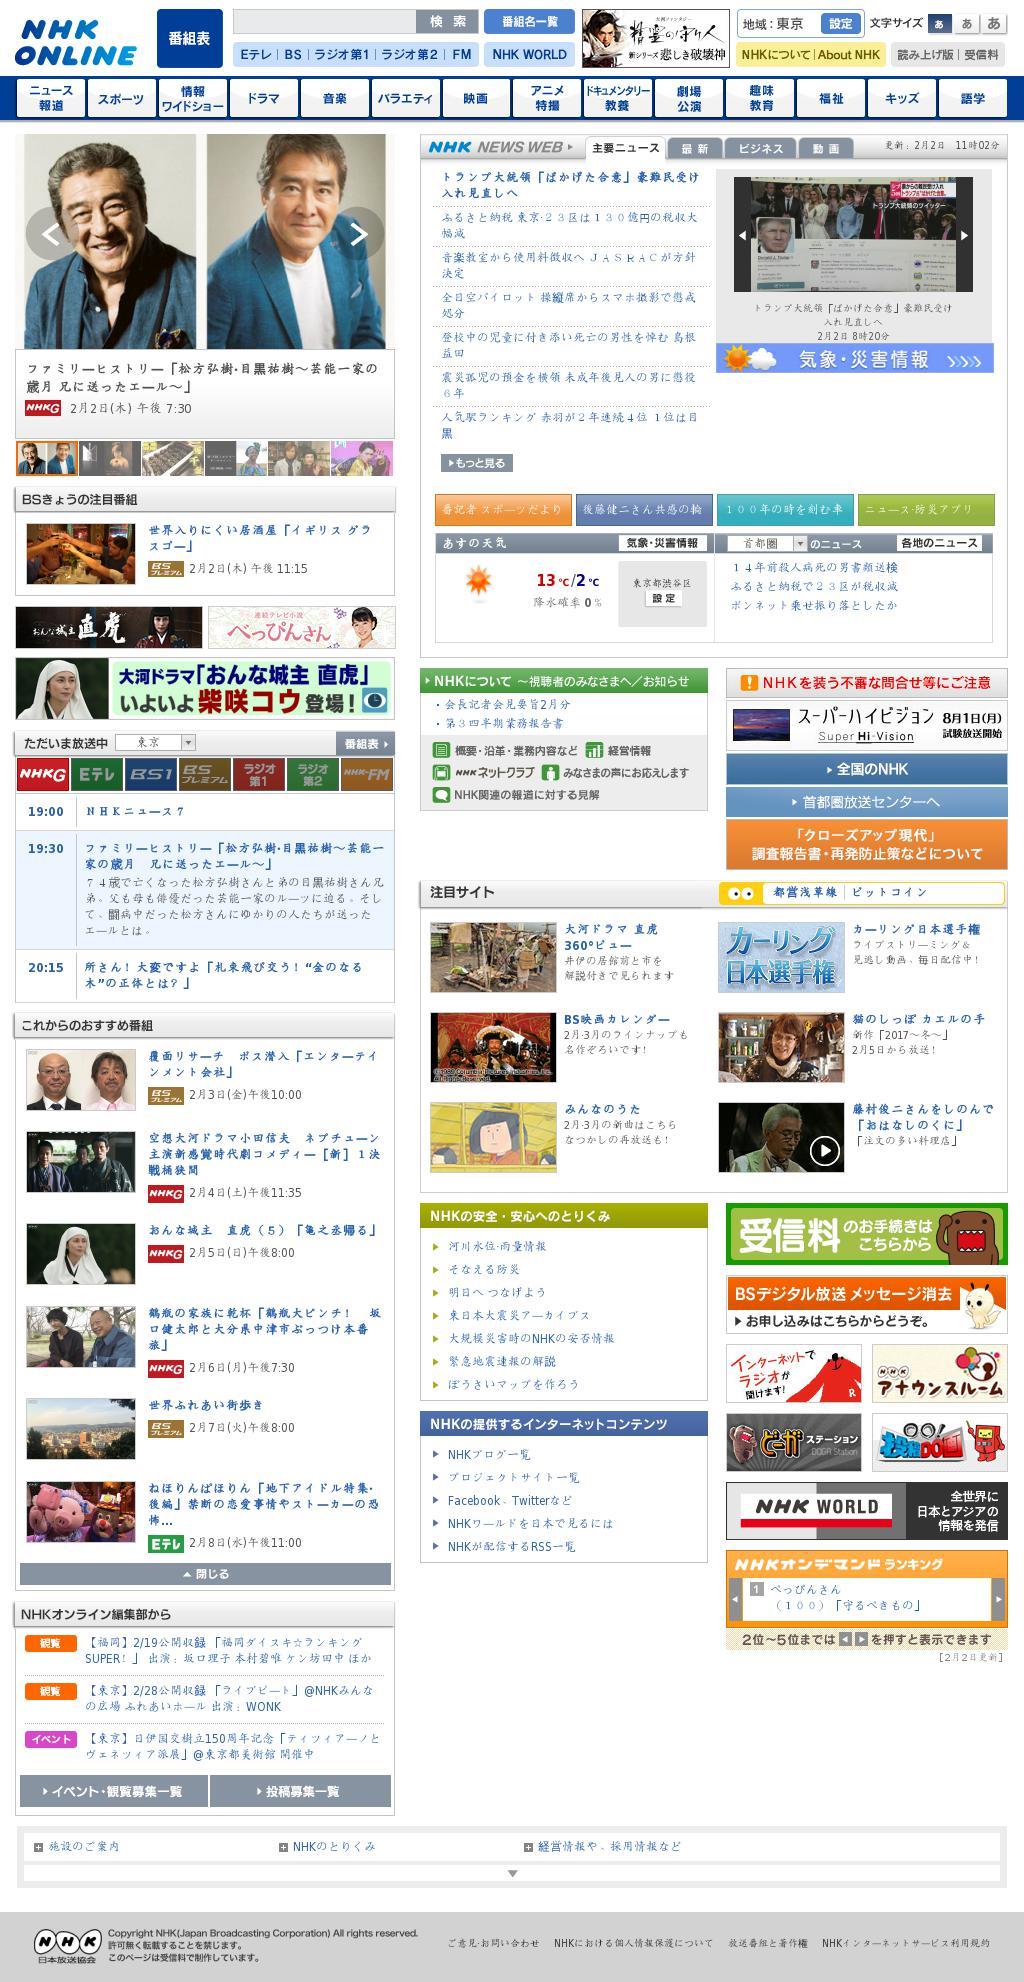 NHK Online at Thursday Feb. 2, 2017, 11:13 a.m. UTC